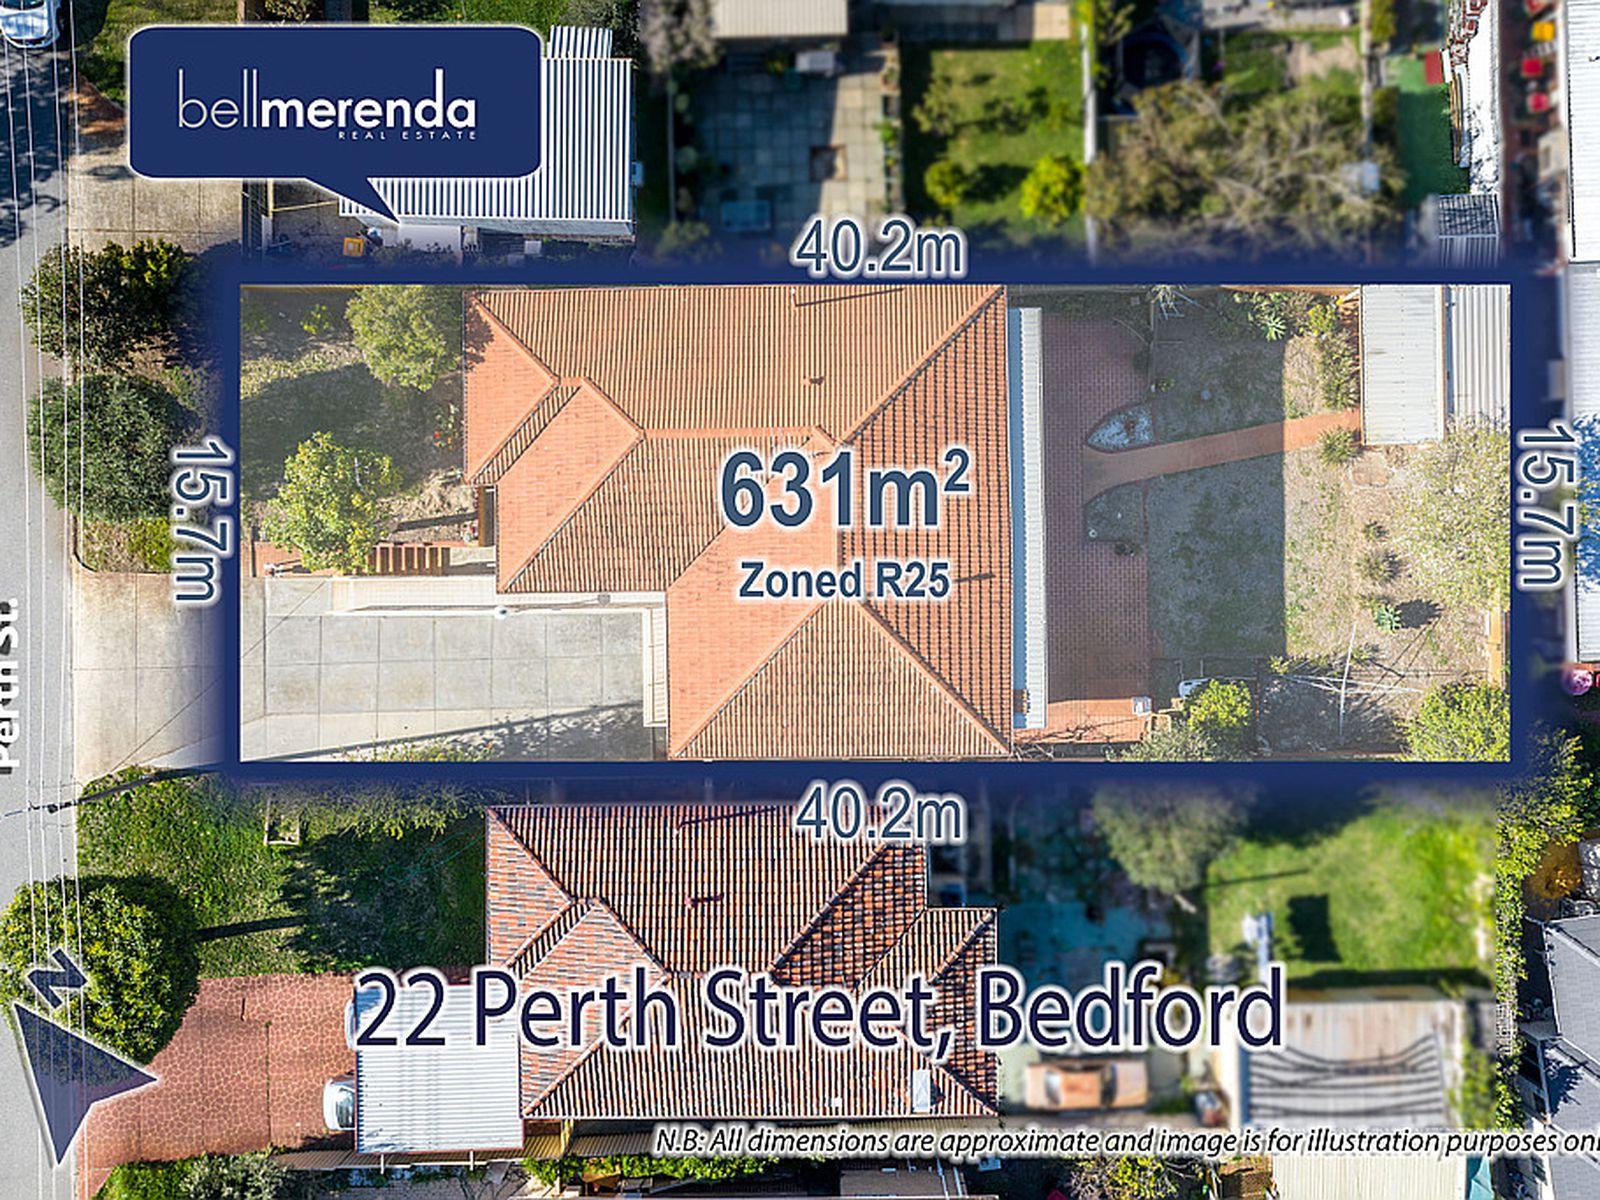 22 Perth Street, Bedford